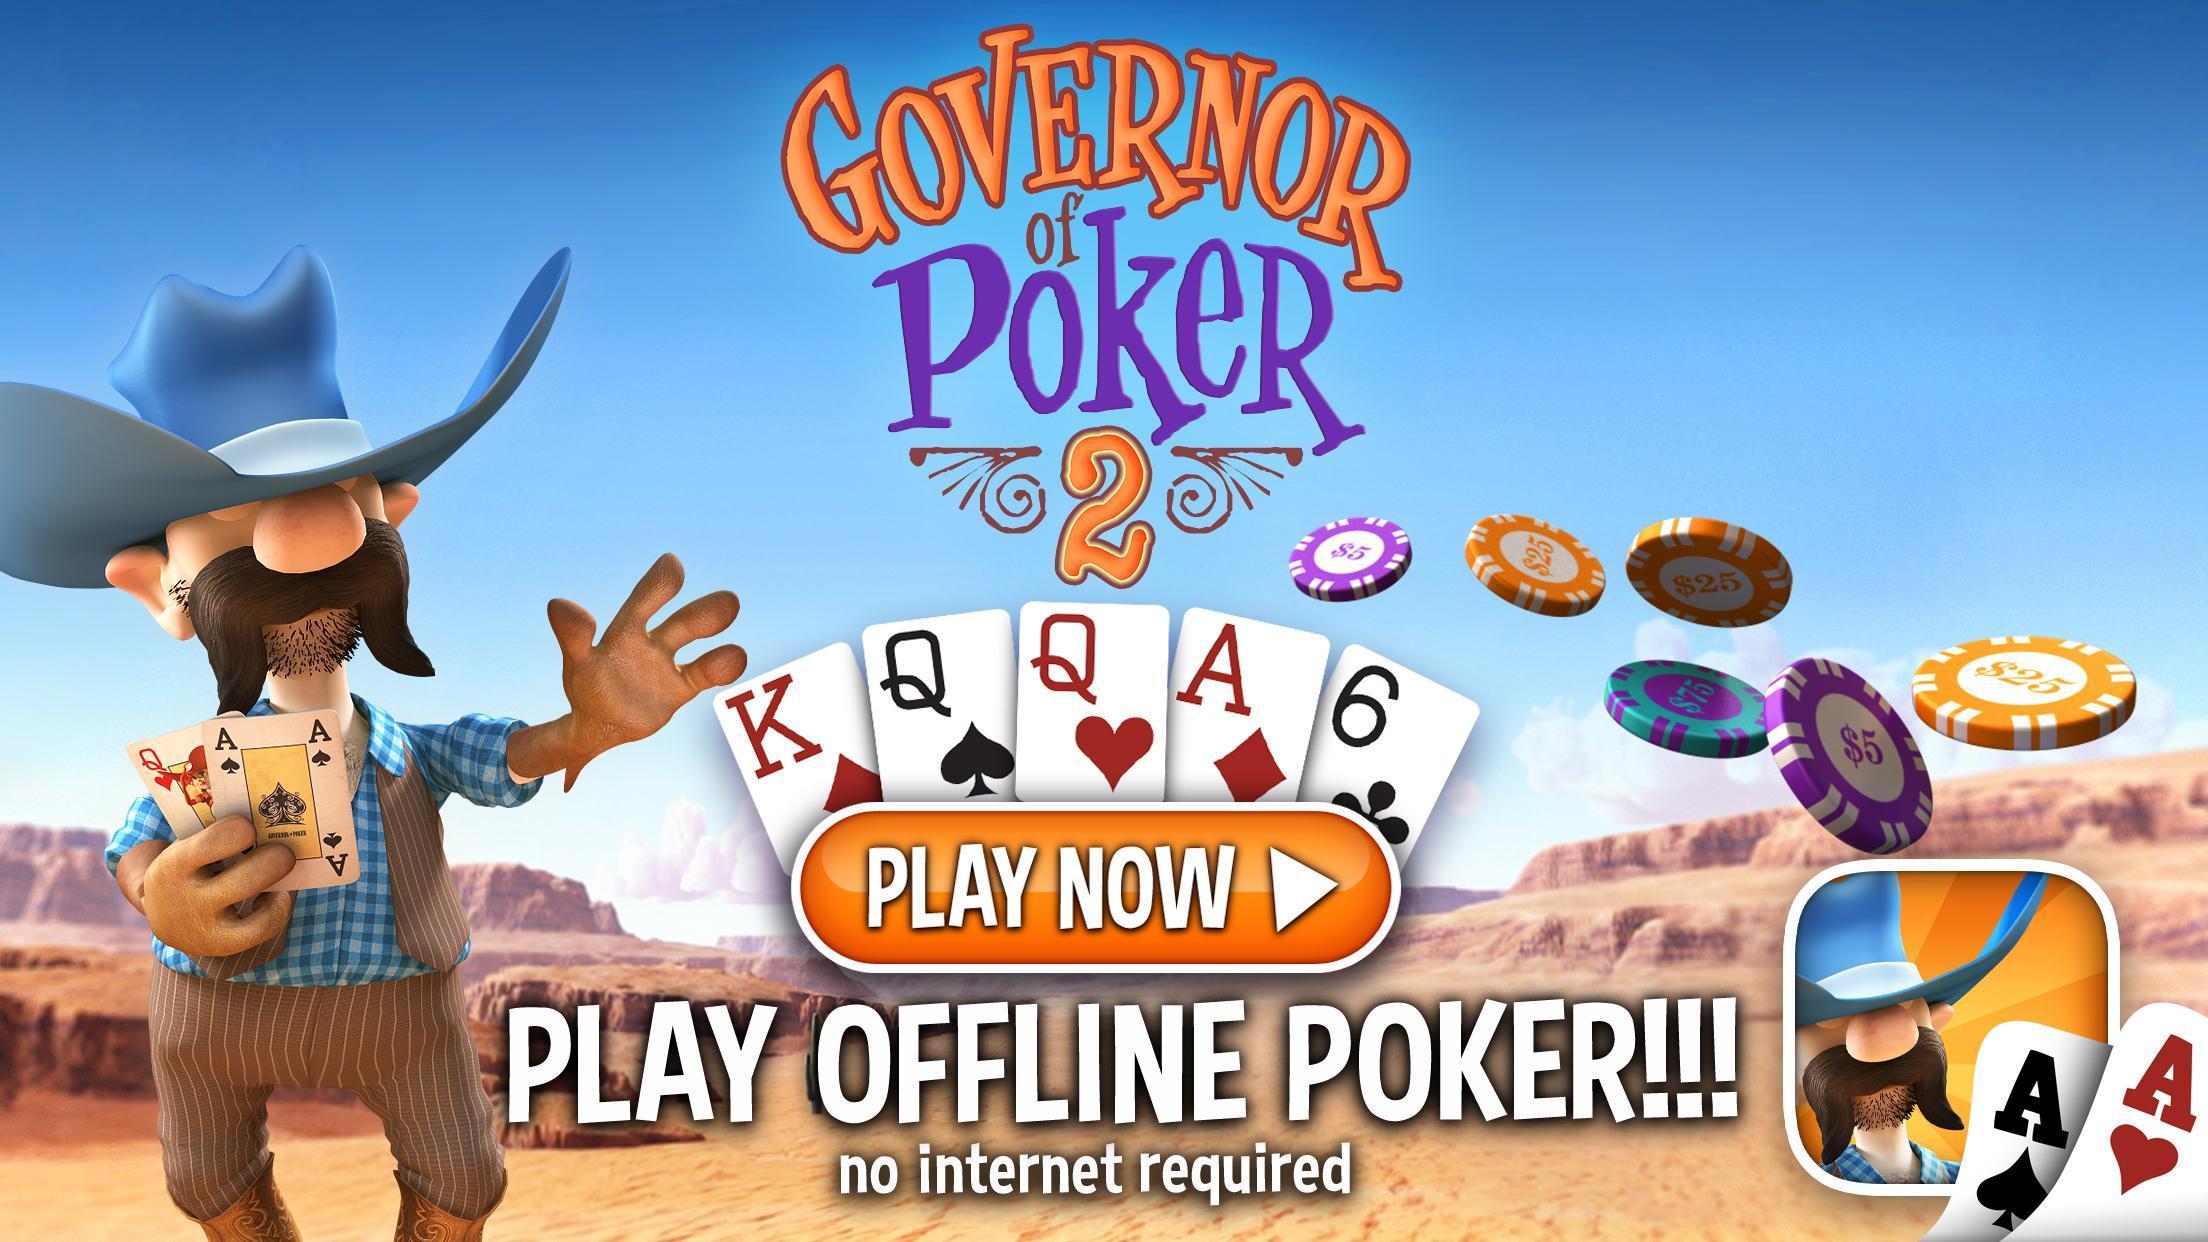 Governor Of Poker 2 Offline Poker Game For Android Apk Download Appsorgames Com